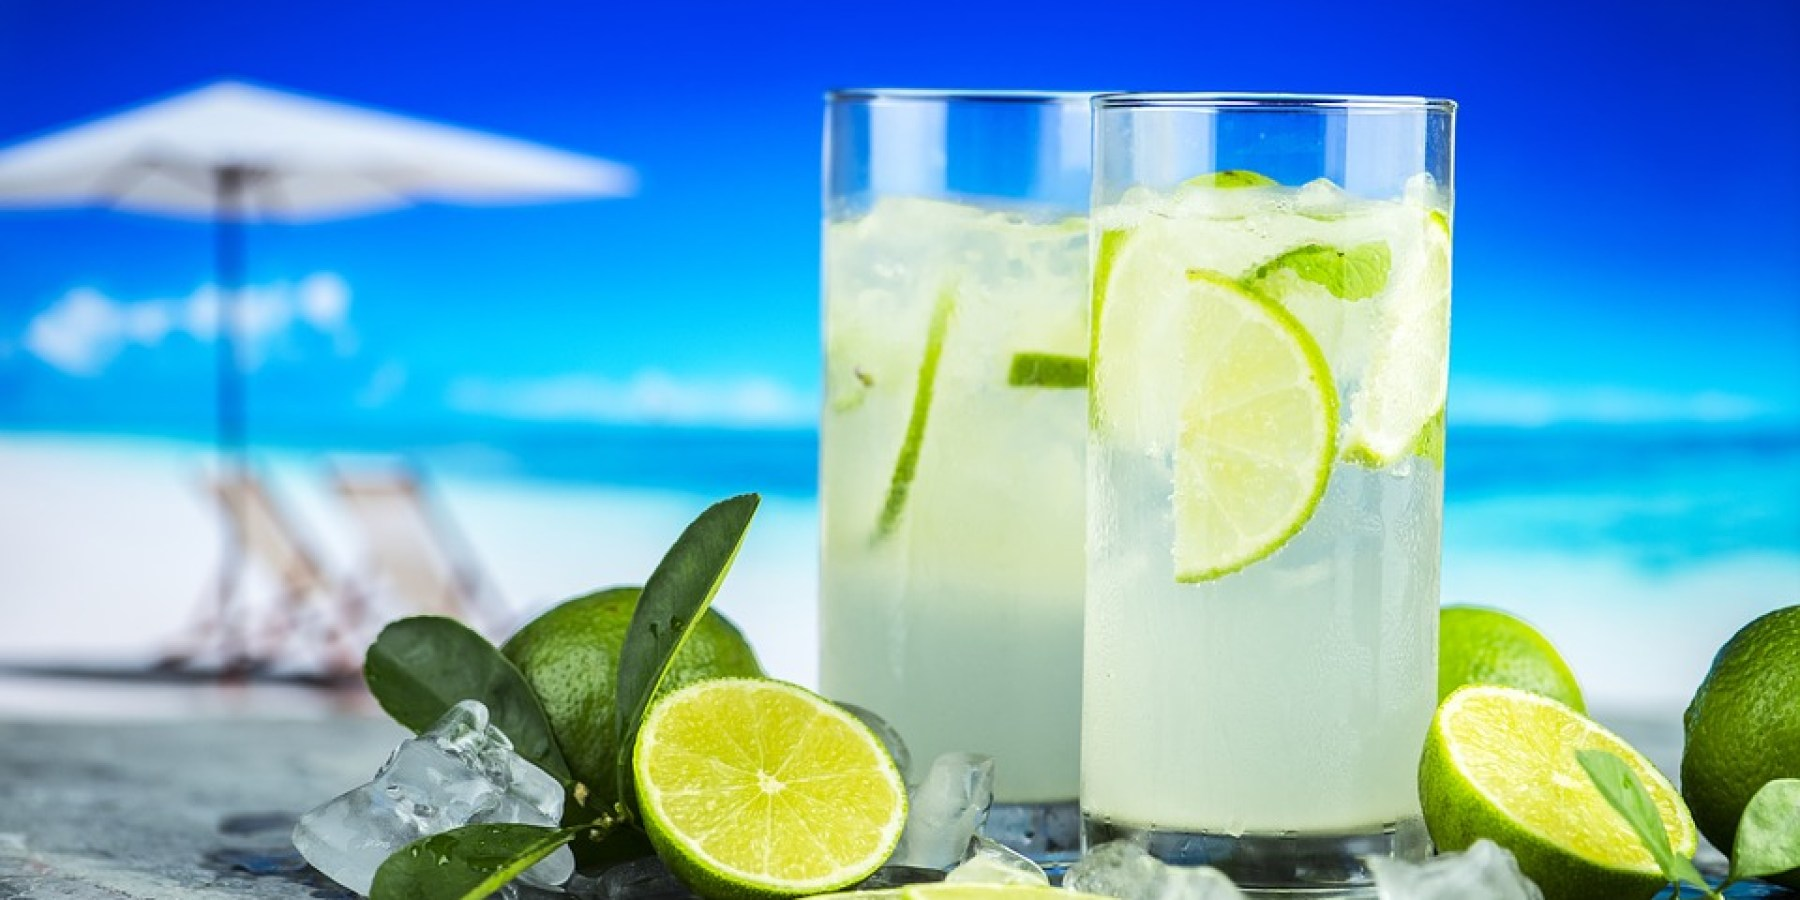 Trinken, bevor der Durst kommt